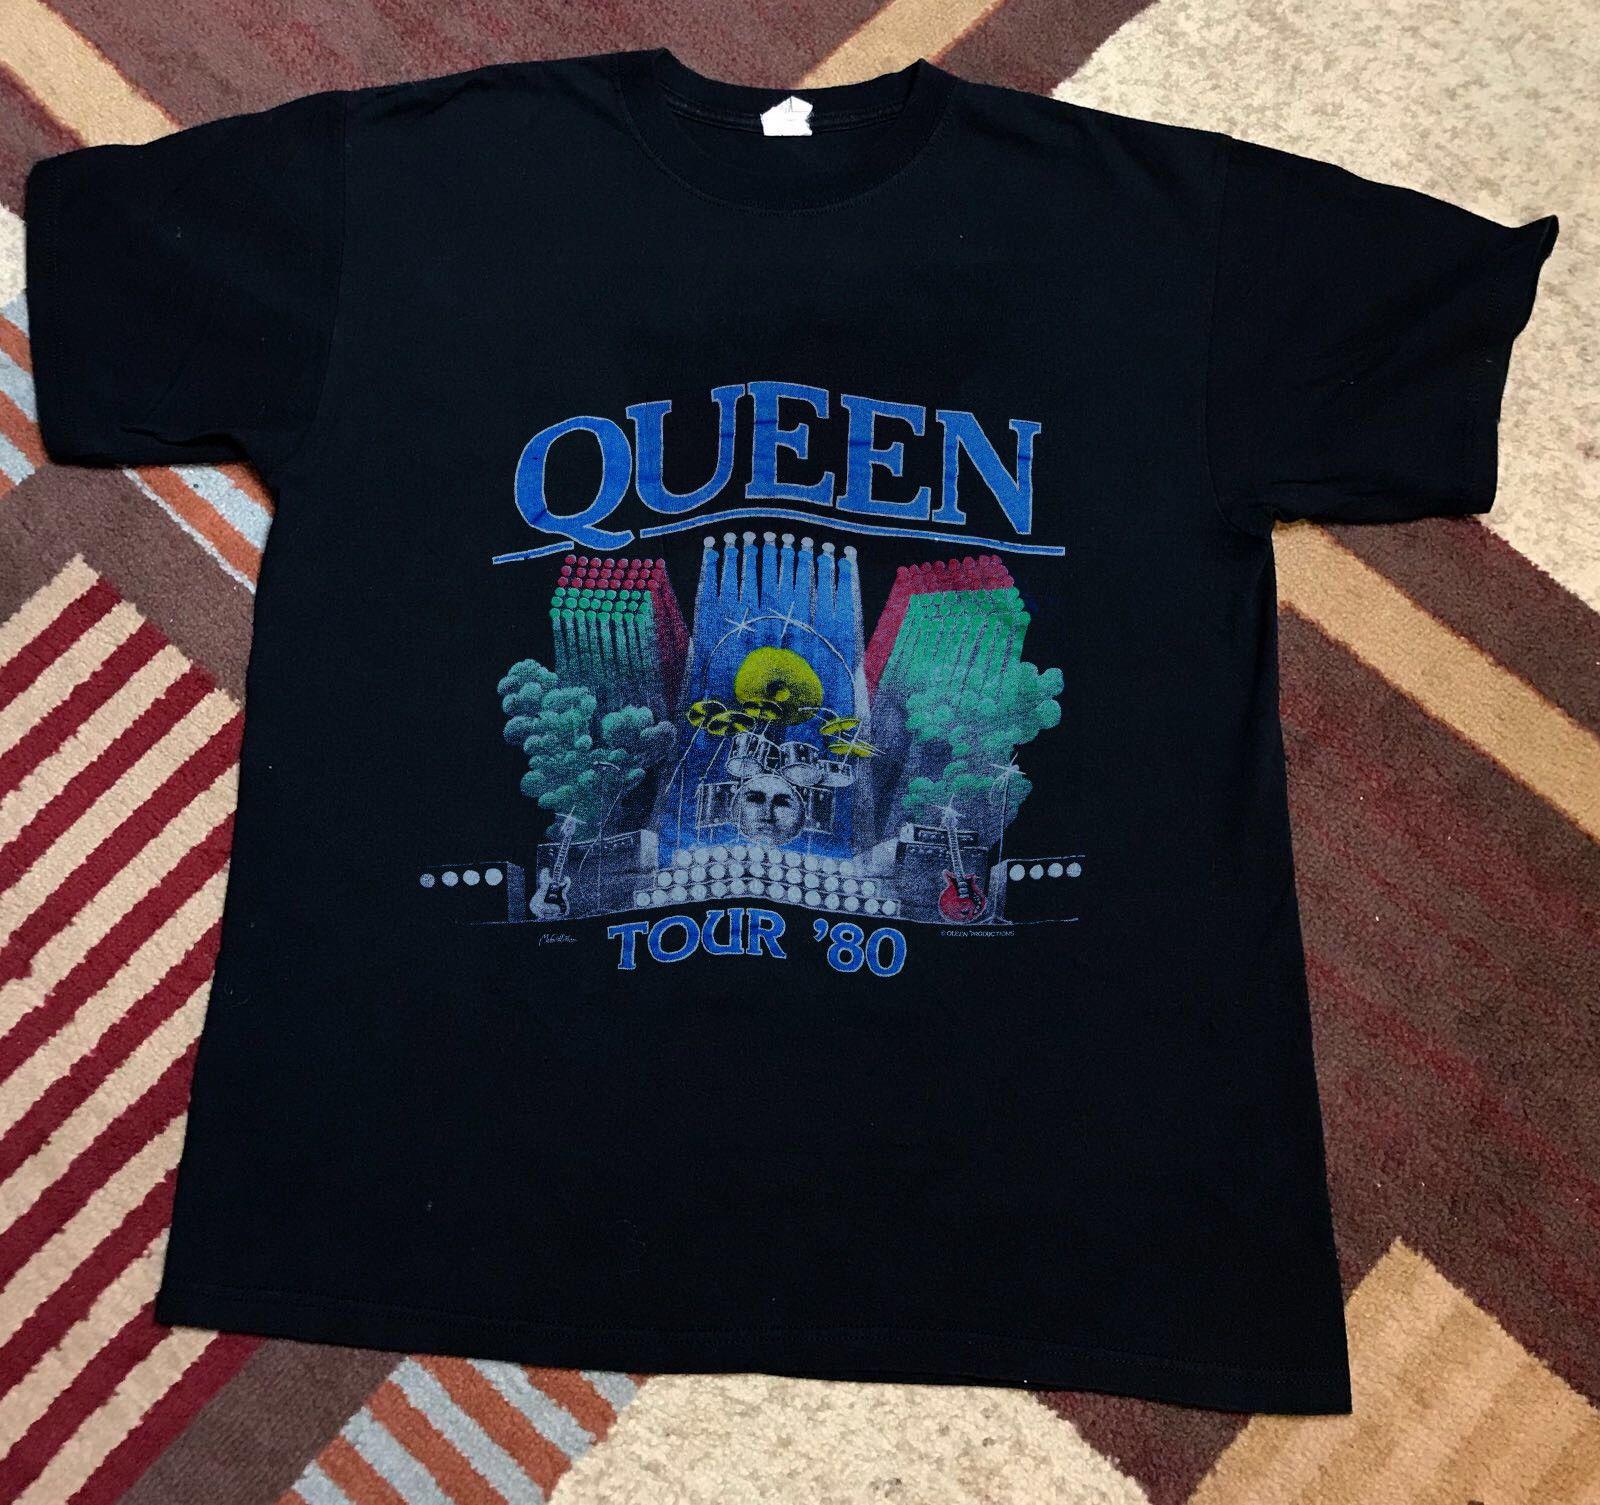 Queen Shirt Vintage Tshirt 1980 The Game Tour Rock Band Freddie Top Tee  REPRINT Make T Shirts Shirt Designs From Breadshirt, $10.49